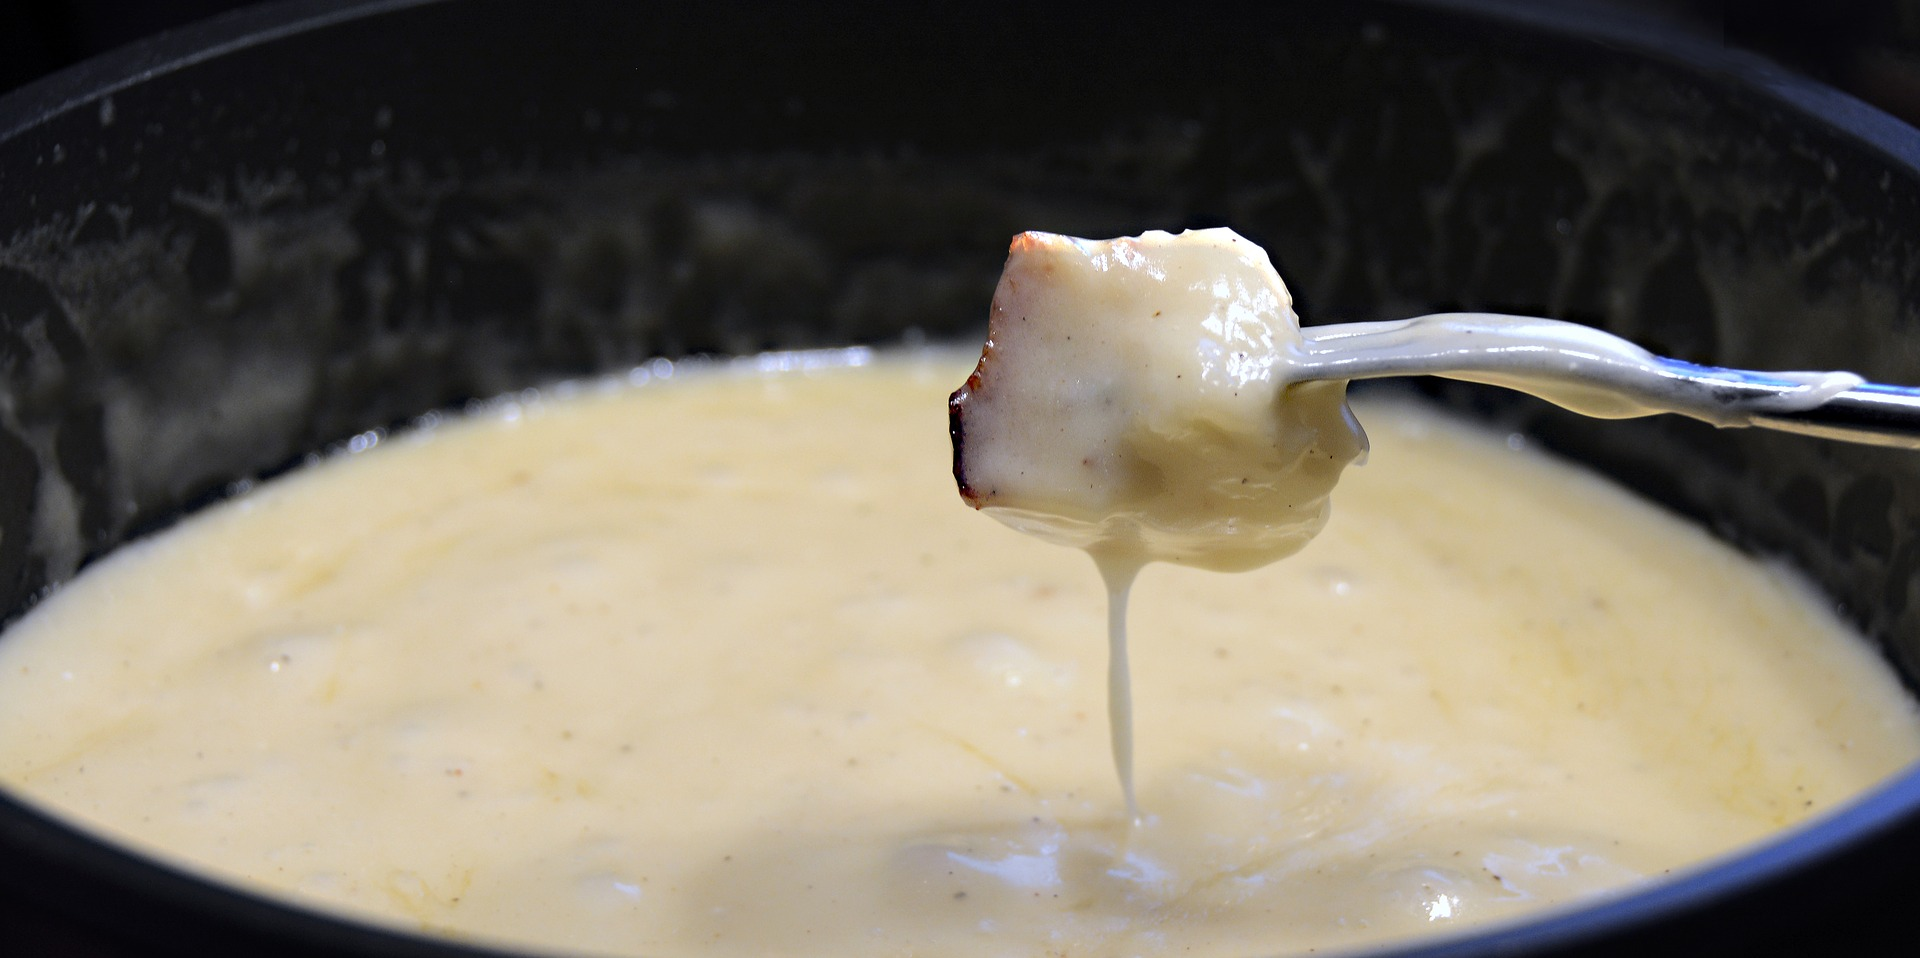 Cheese Fondue in a Pot